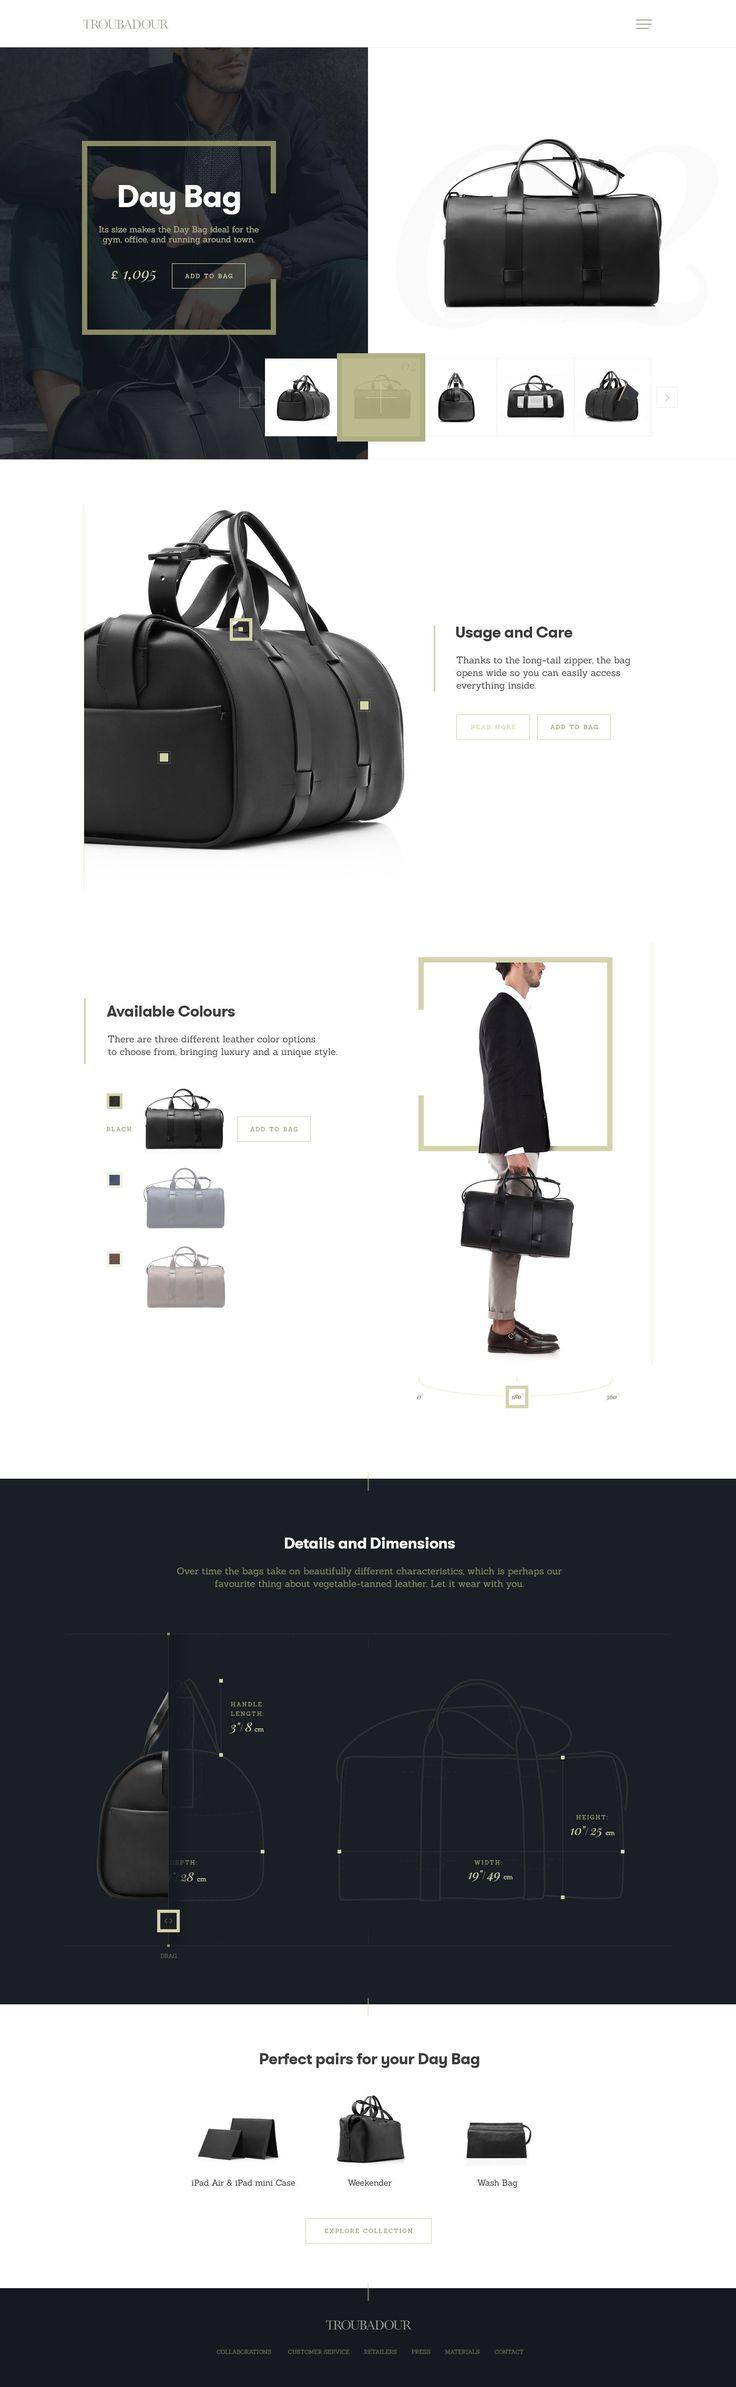 Web Design Inspiration: Product Pages - Web Design Ledger